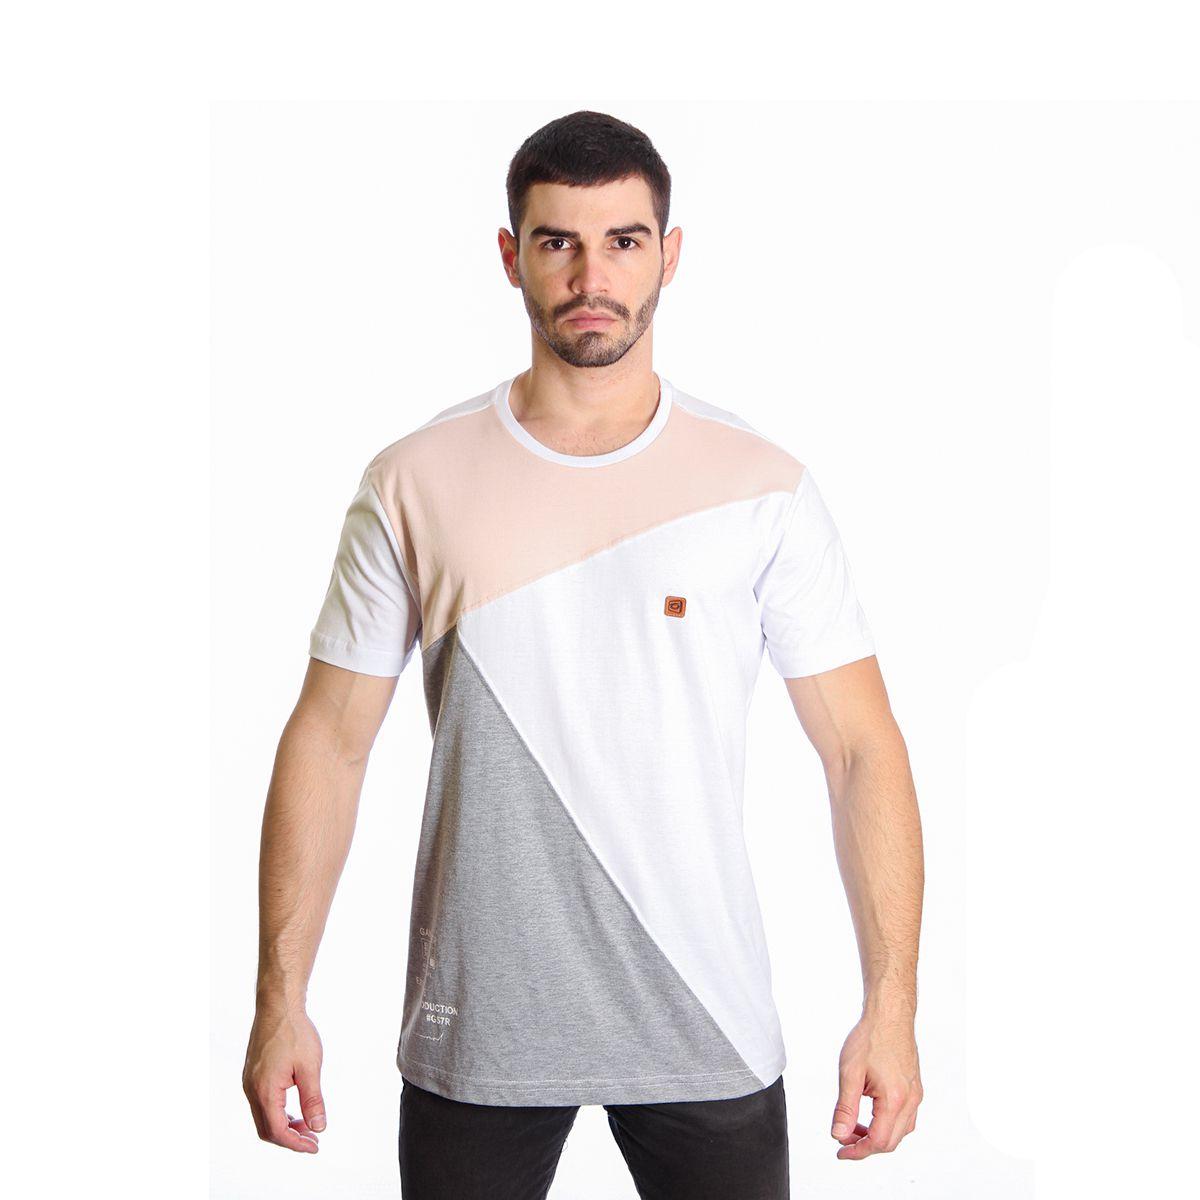 Camiseta Masculina Básica Estampada Gangster 11.19.2467